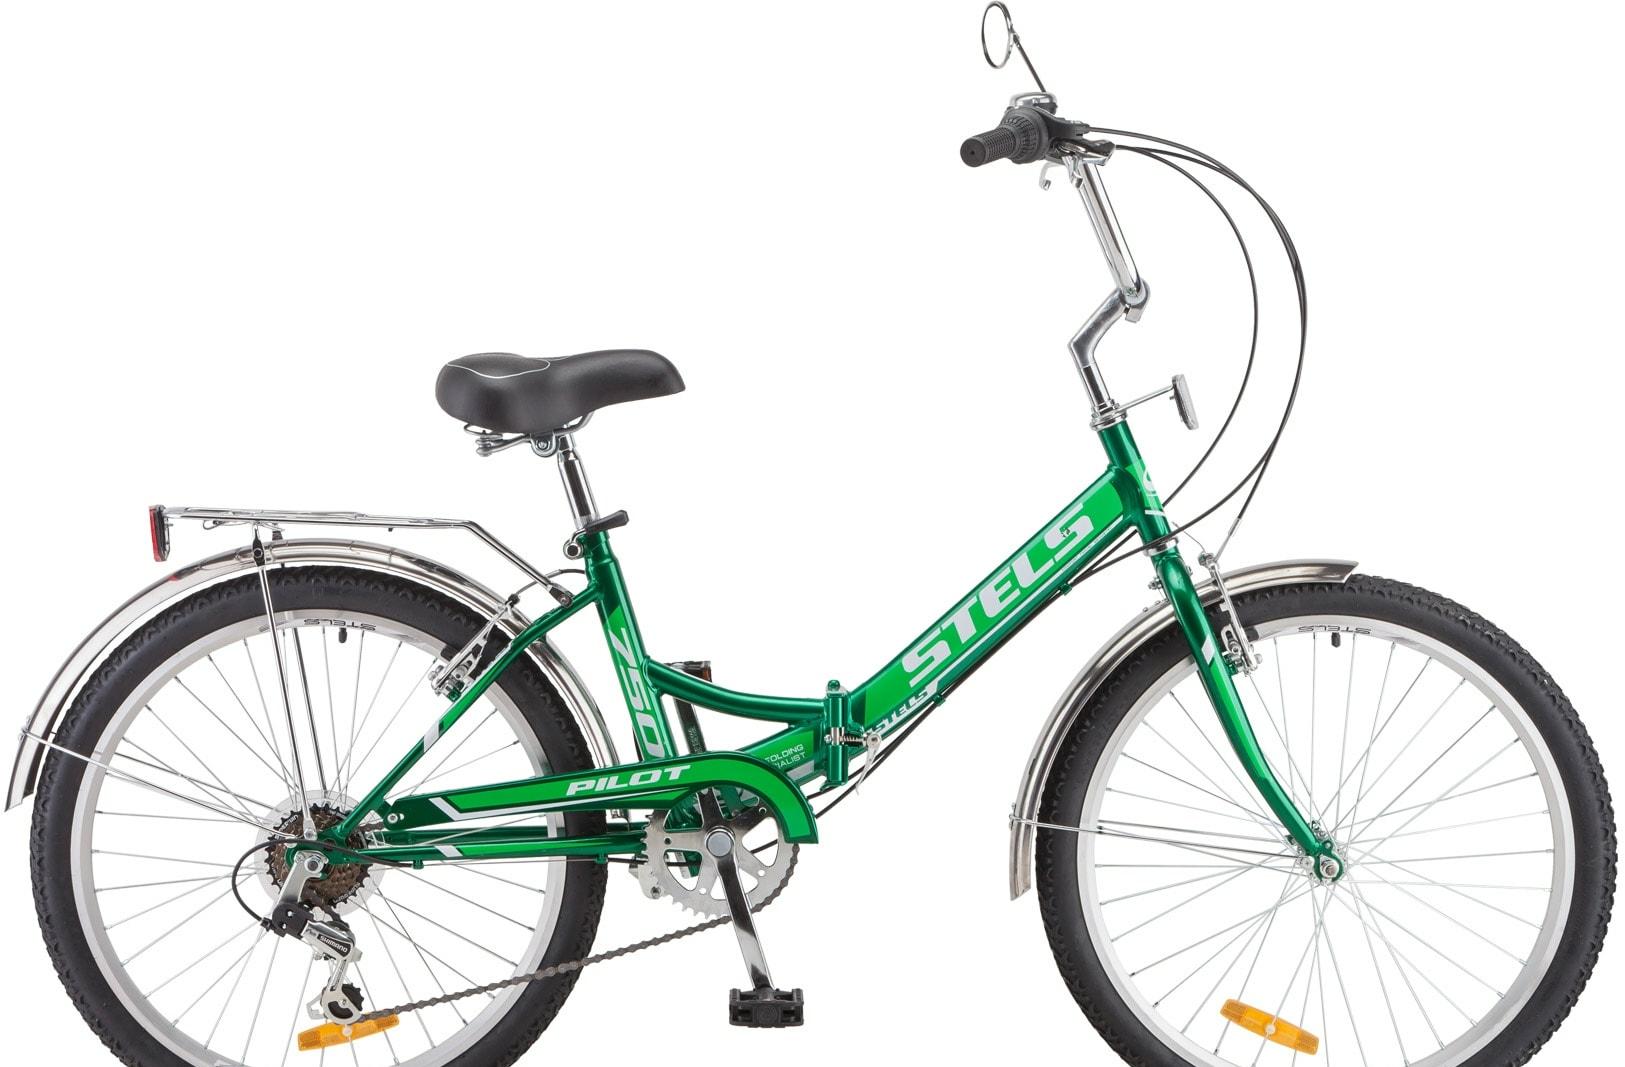 Велосипед Stels Pilot 750 24 Z010 2020 (зеленый)